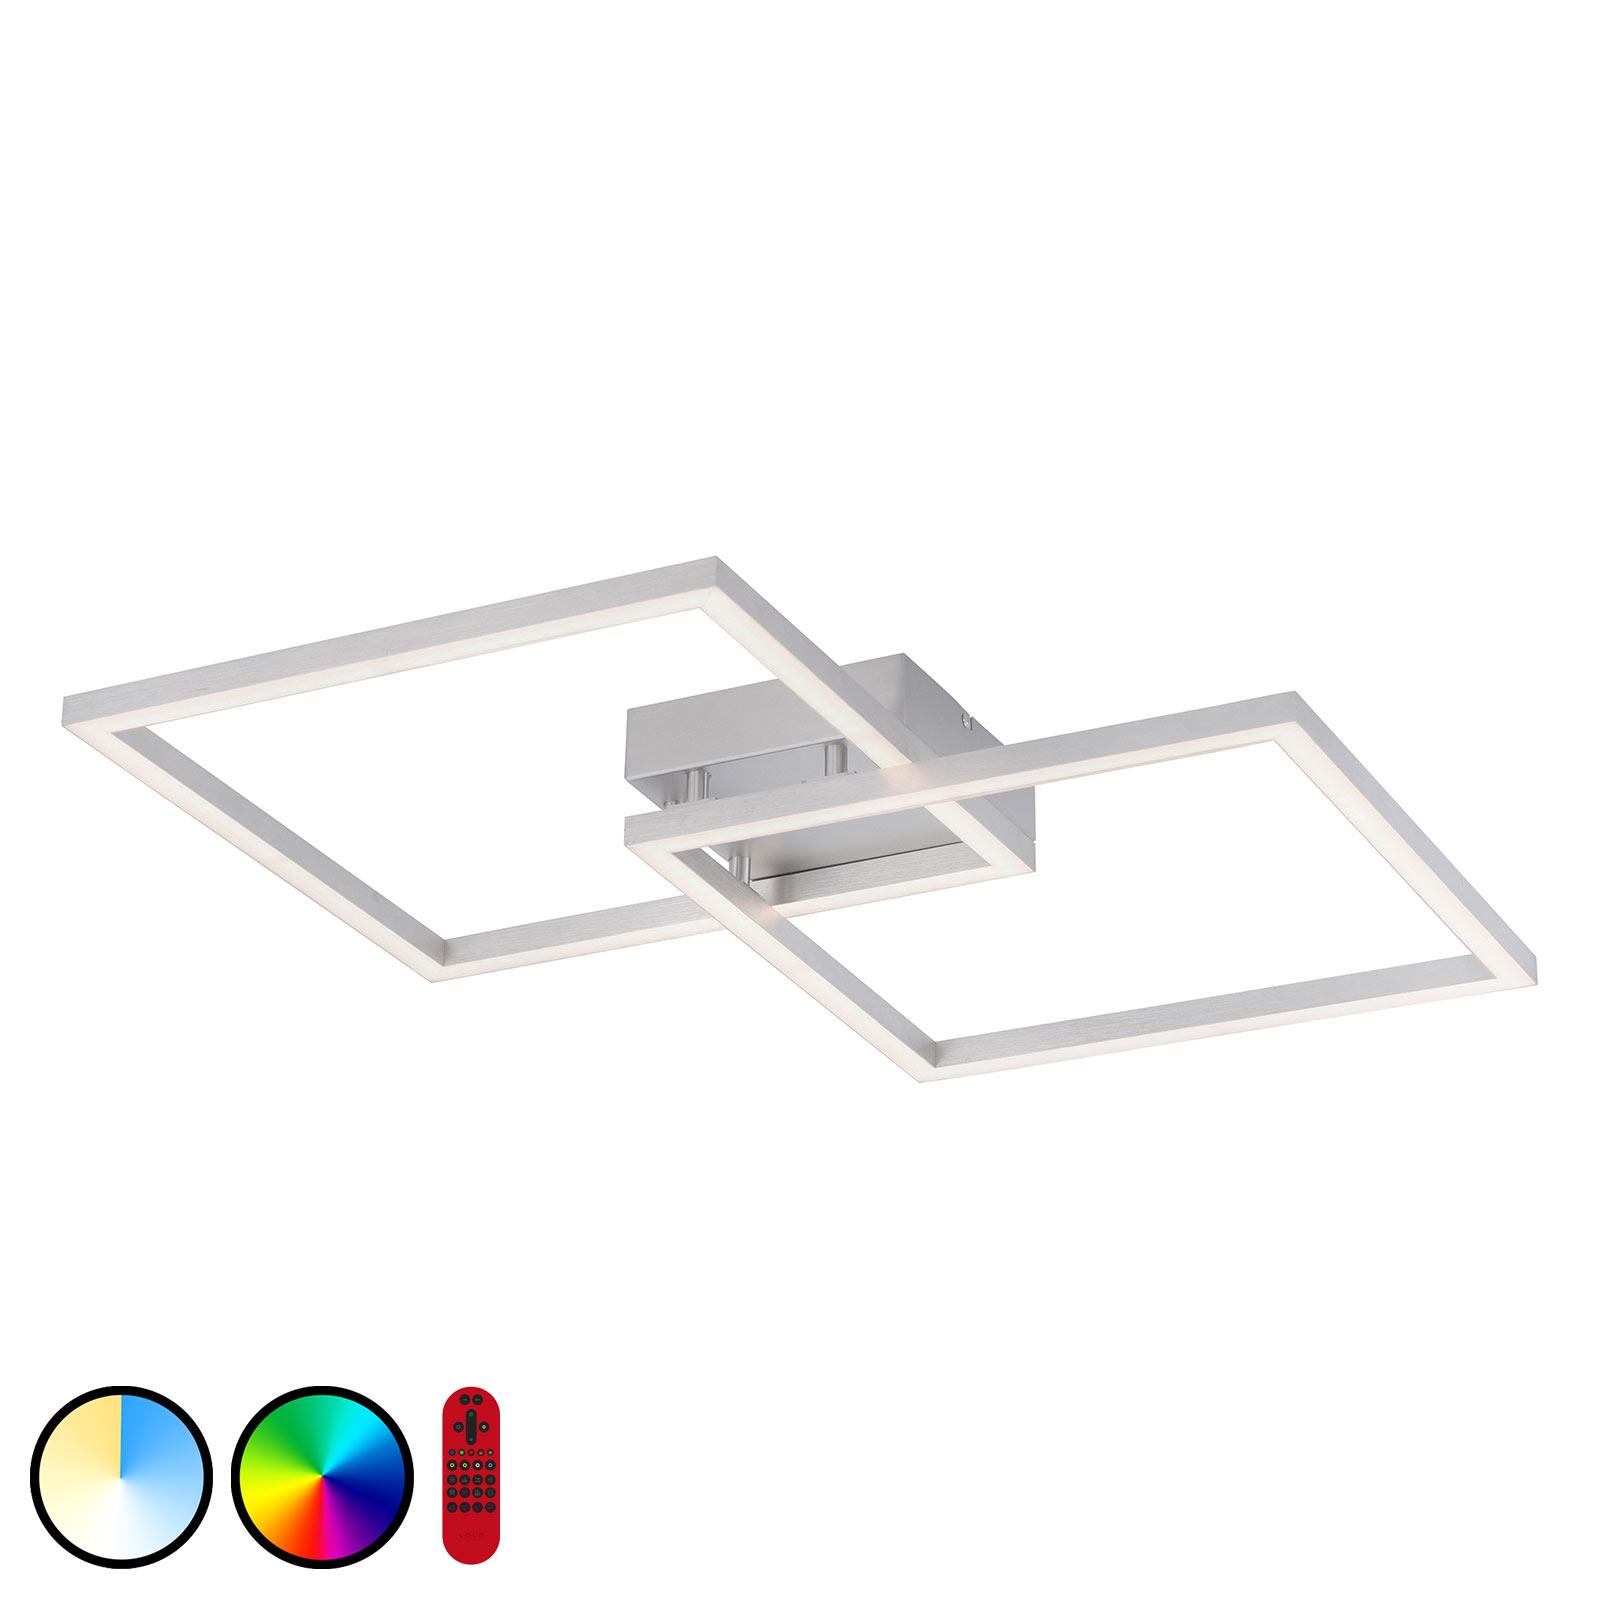 LED plafondlamp LOLAsmart Maxi